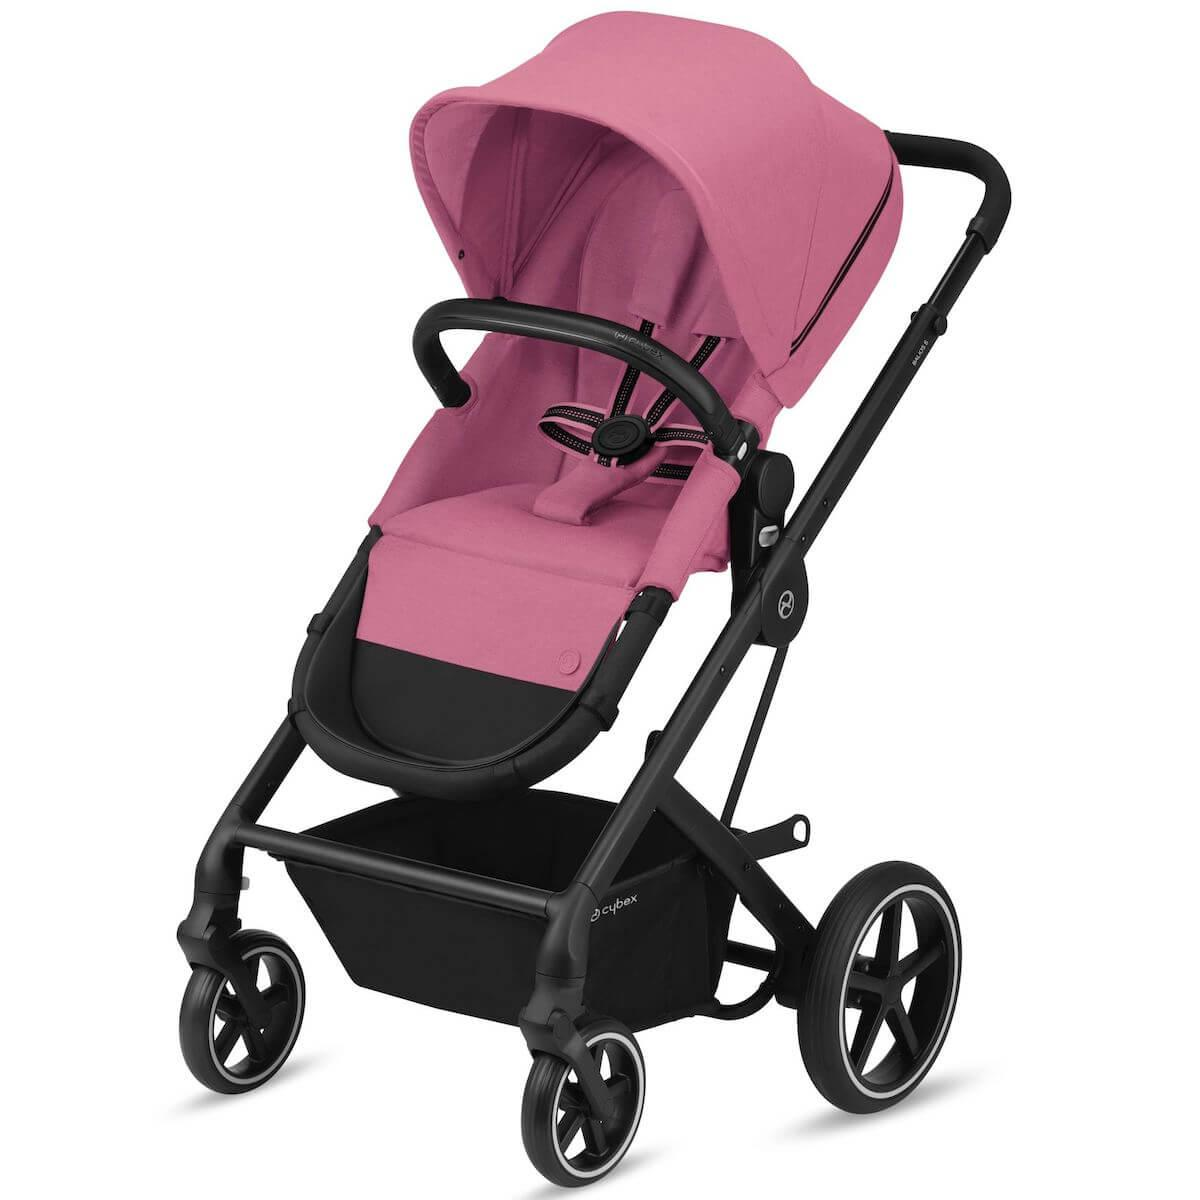 Kinderwagen BALIOS S LUX BLK Cybex Magnolia Pink